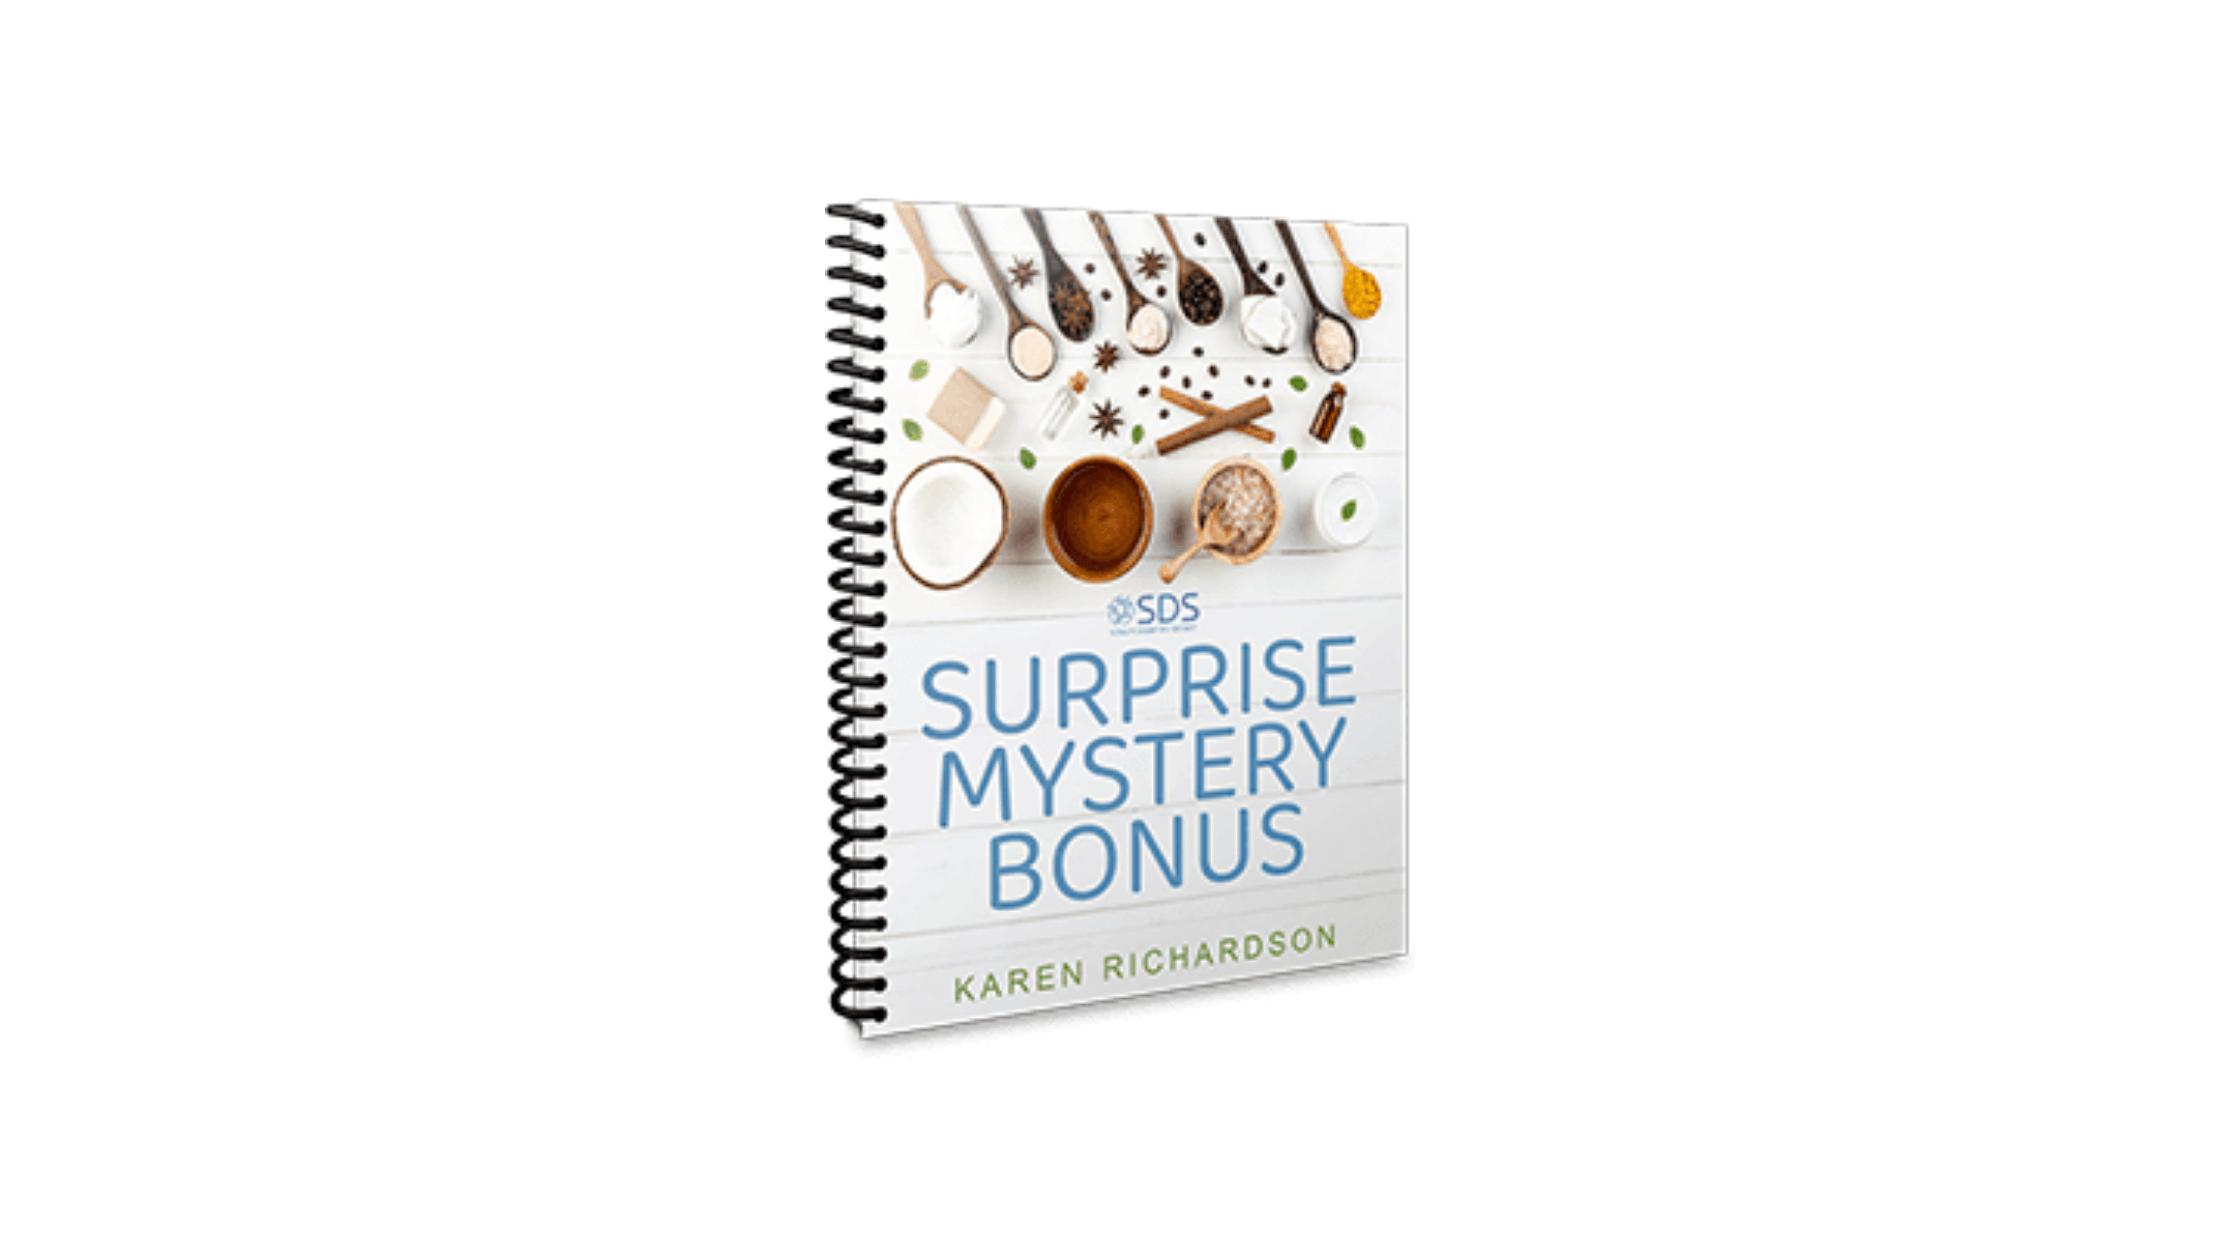 Surprise Mystery Bonus